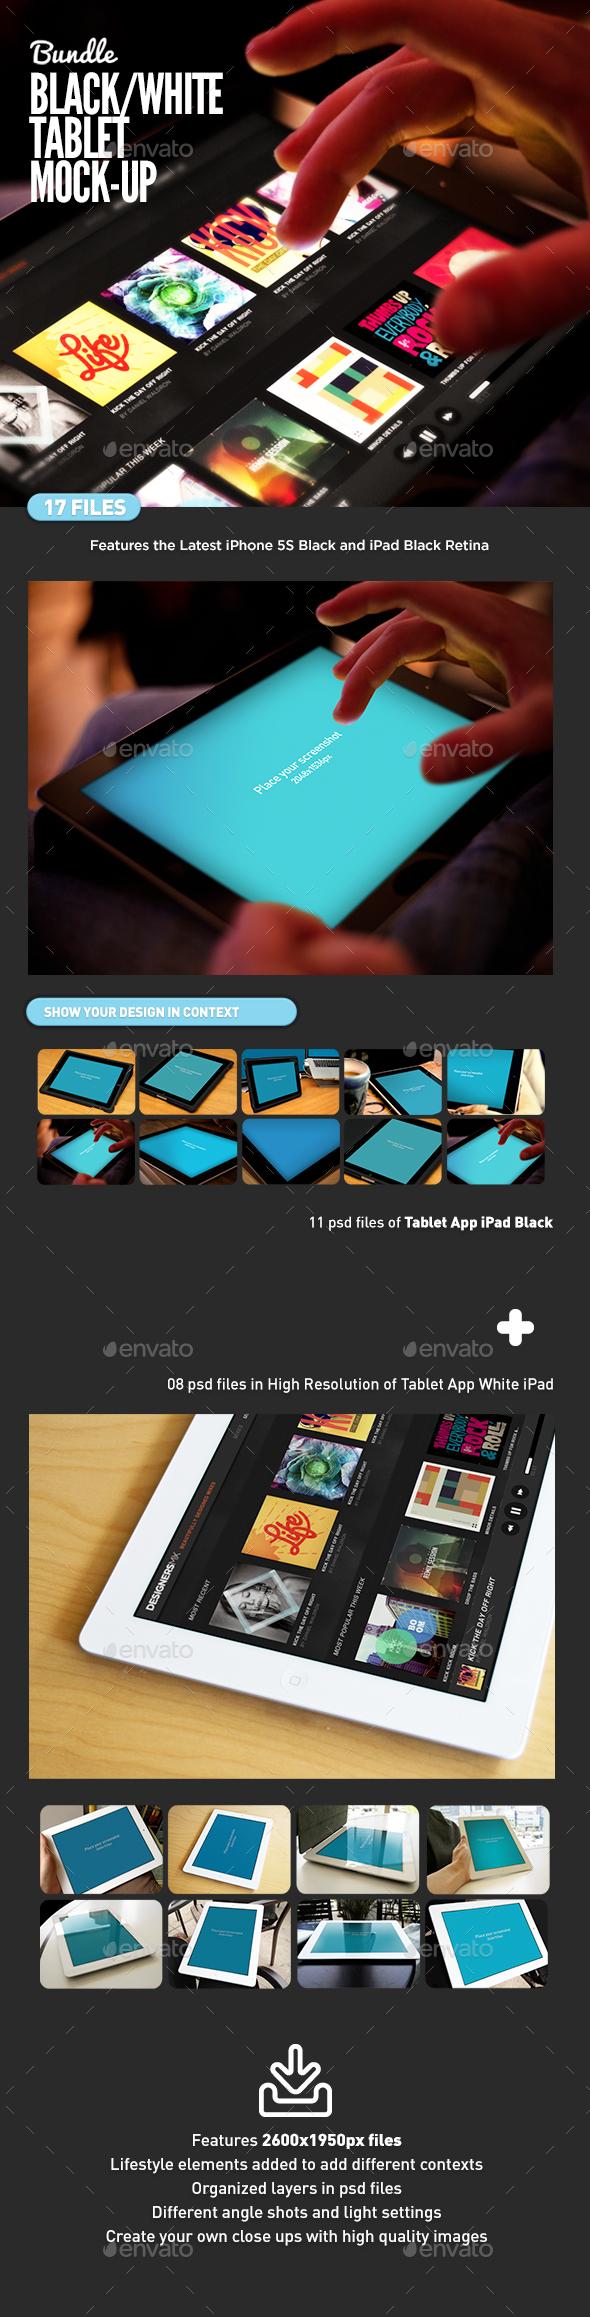 Black and White Pad Tablet MockUp Bundle